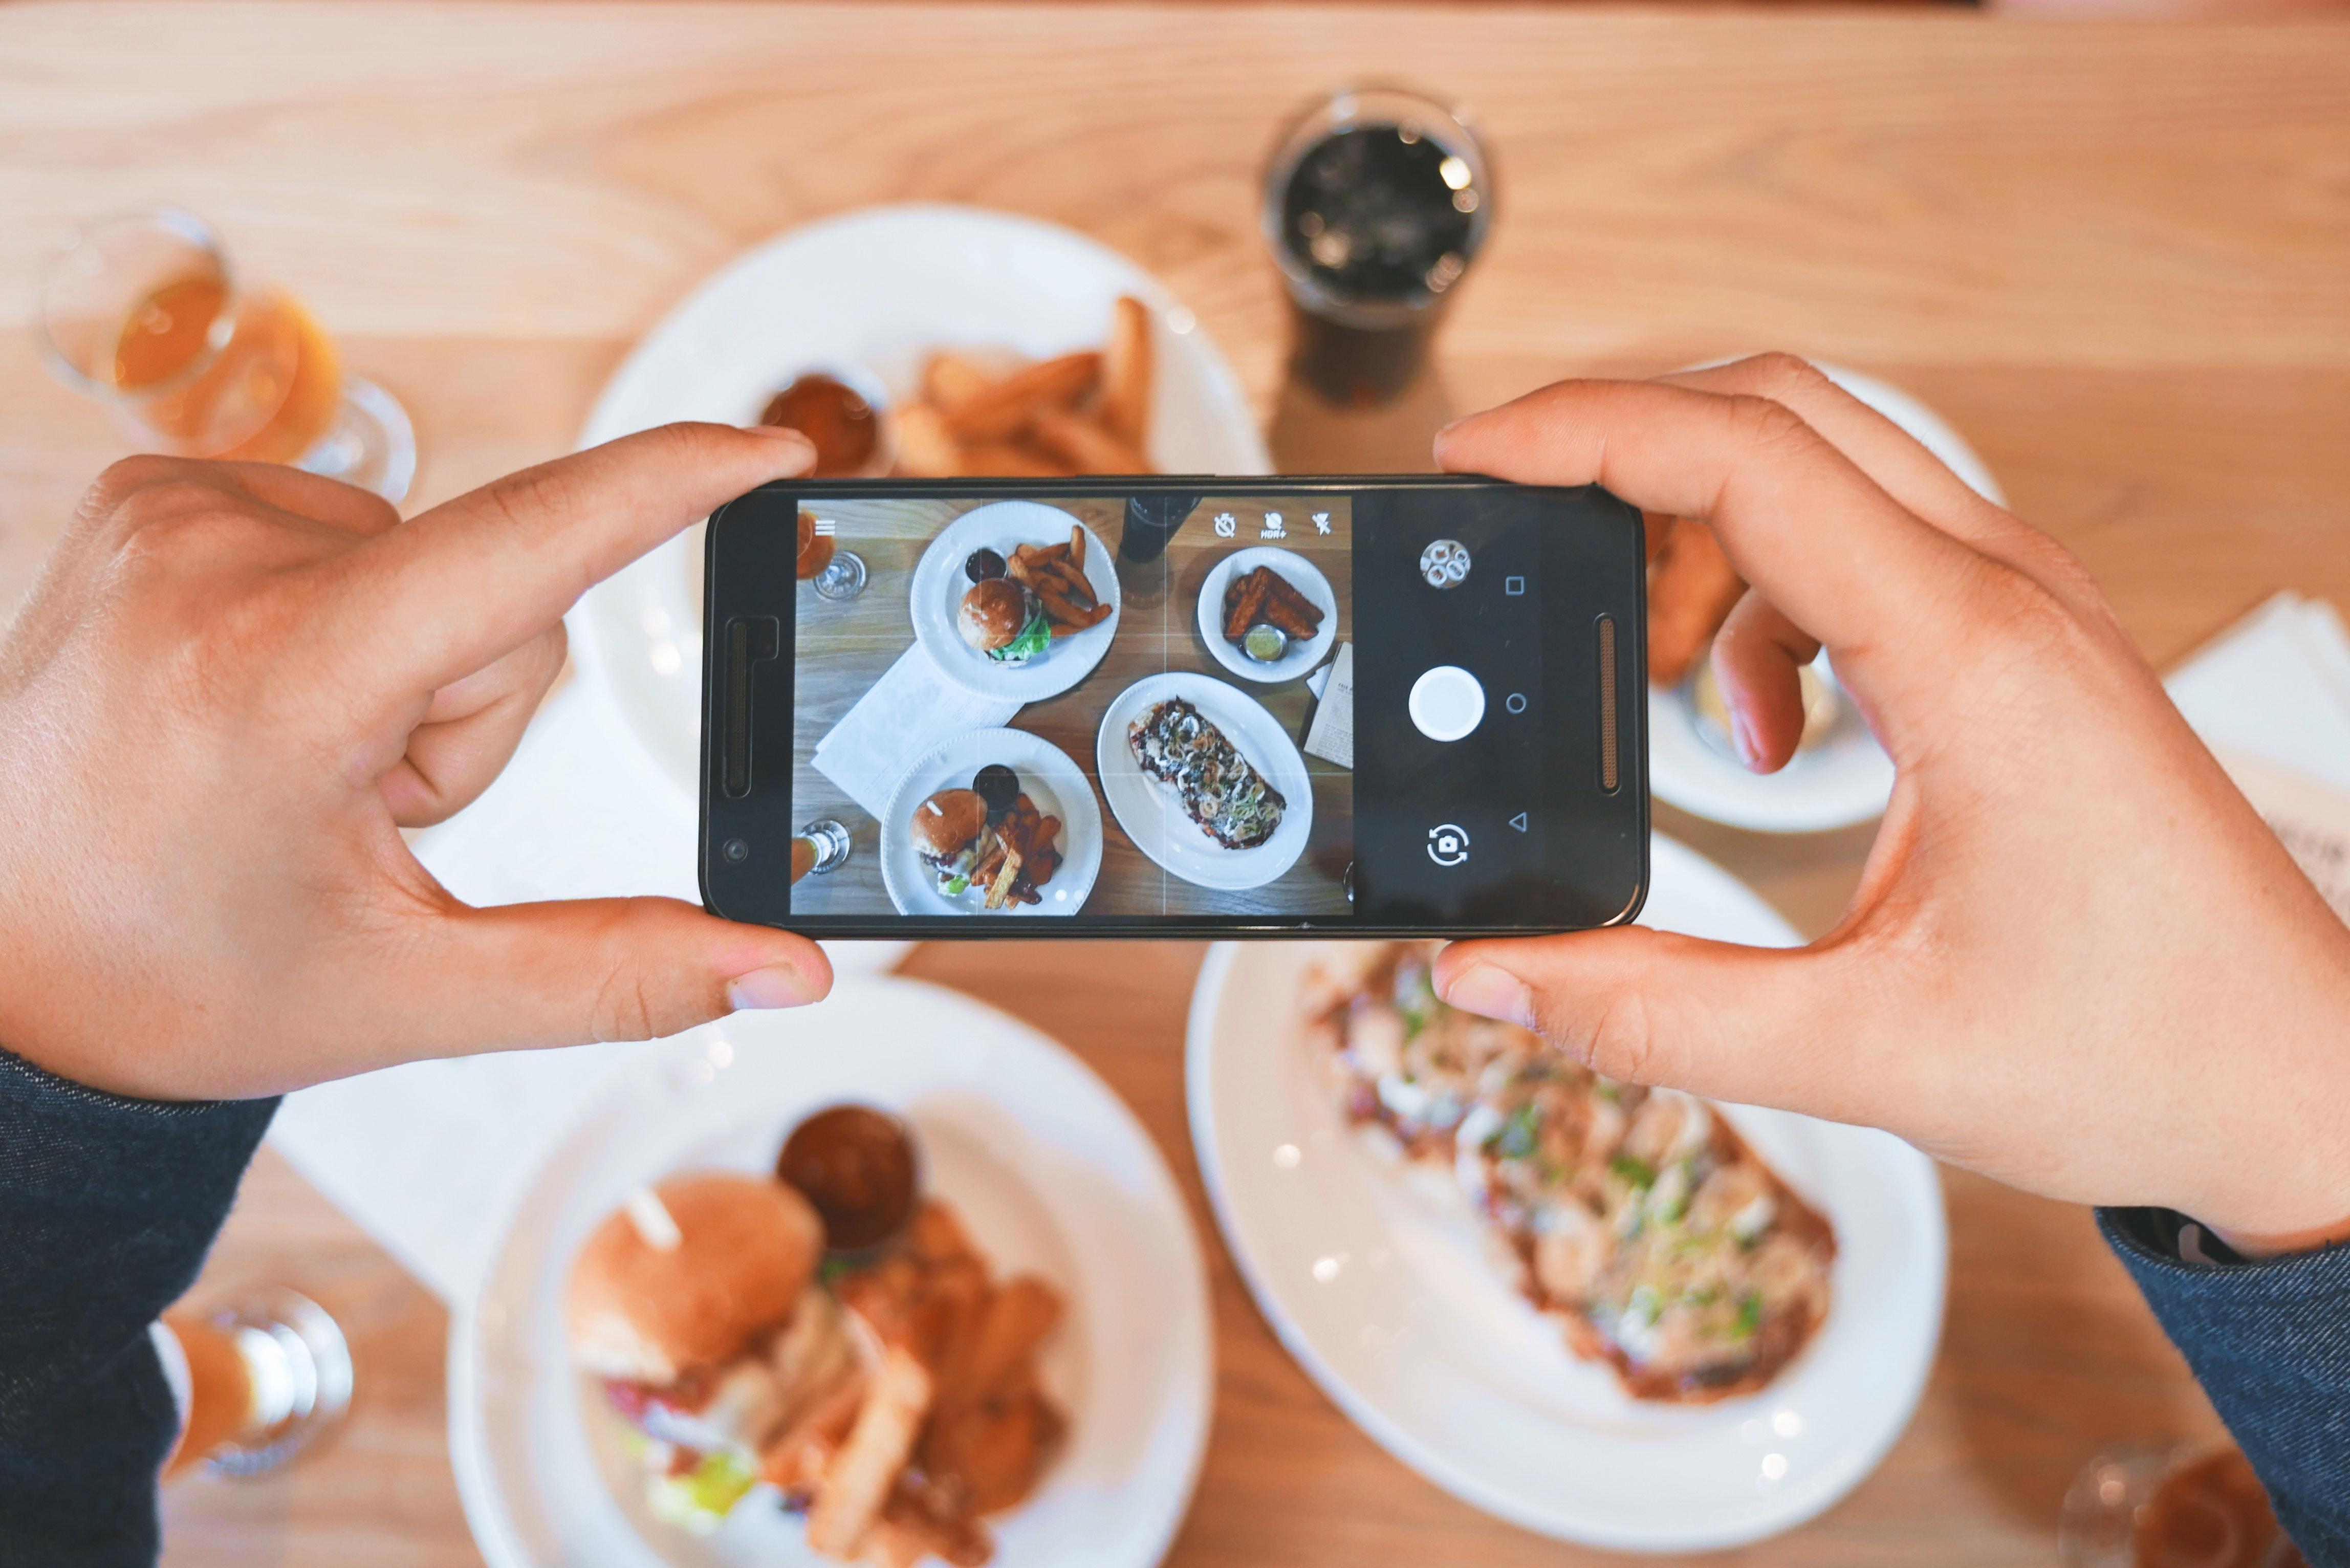 eaters-collective-i_xVfNtQjwI-unsplash.jpg